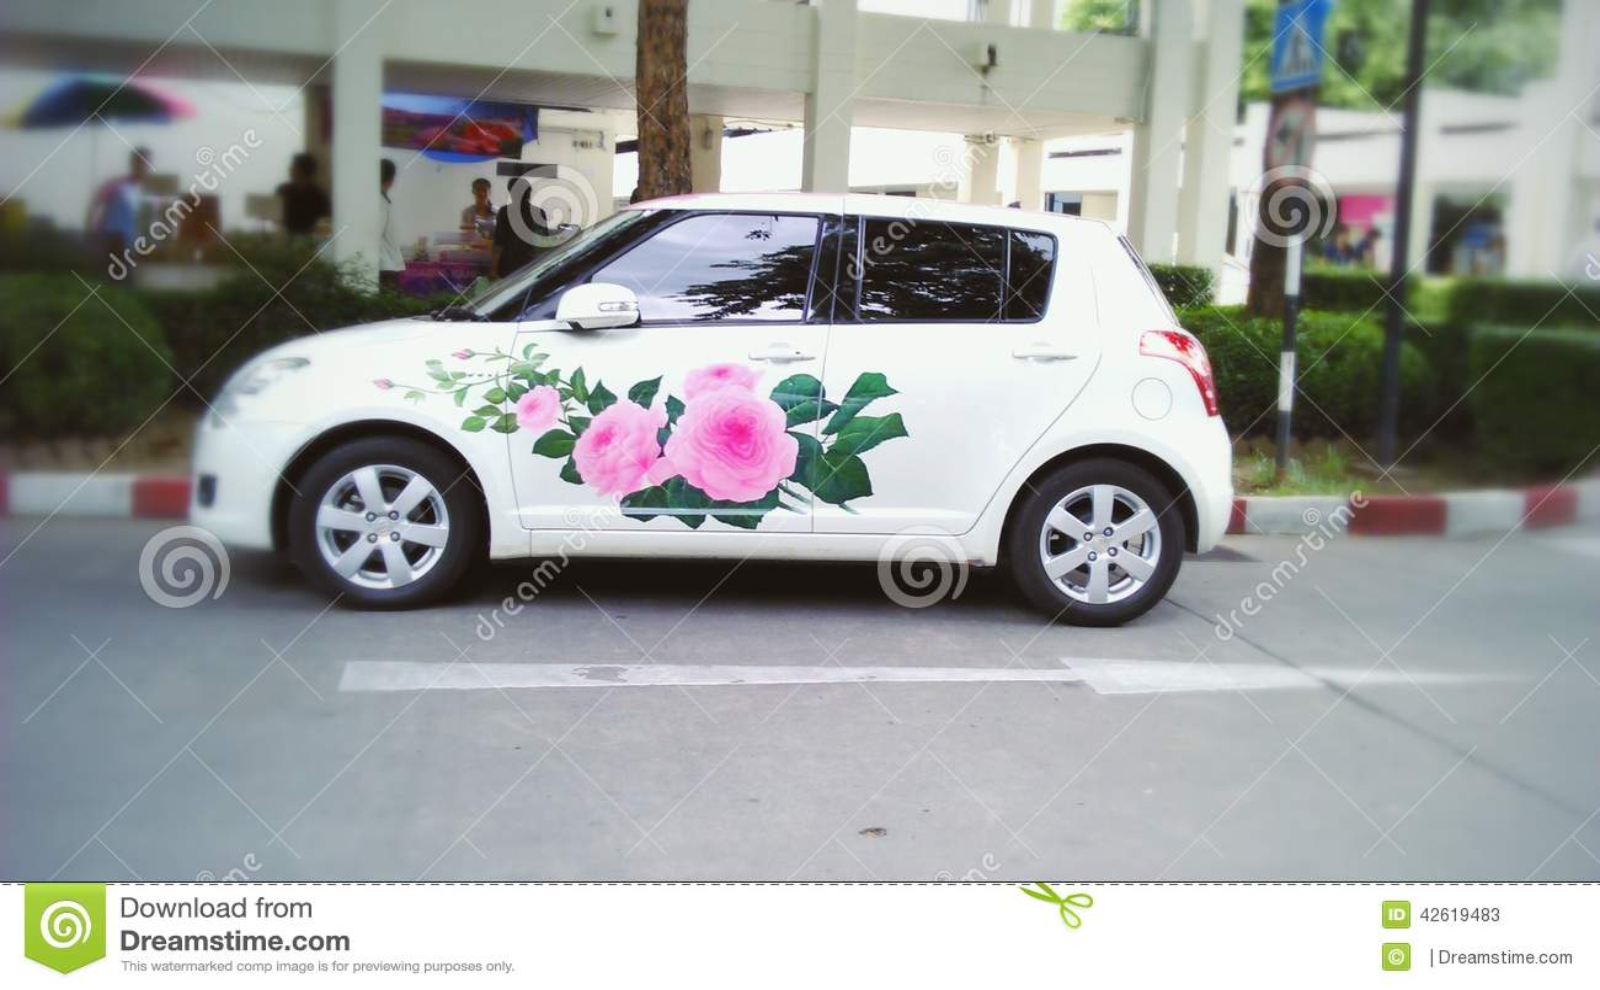 Artist Mini Car Editorial Stock Photo Image Of Painting 42619483